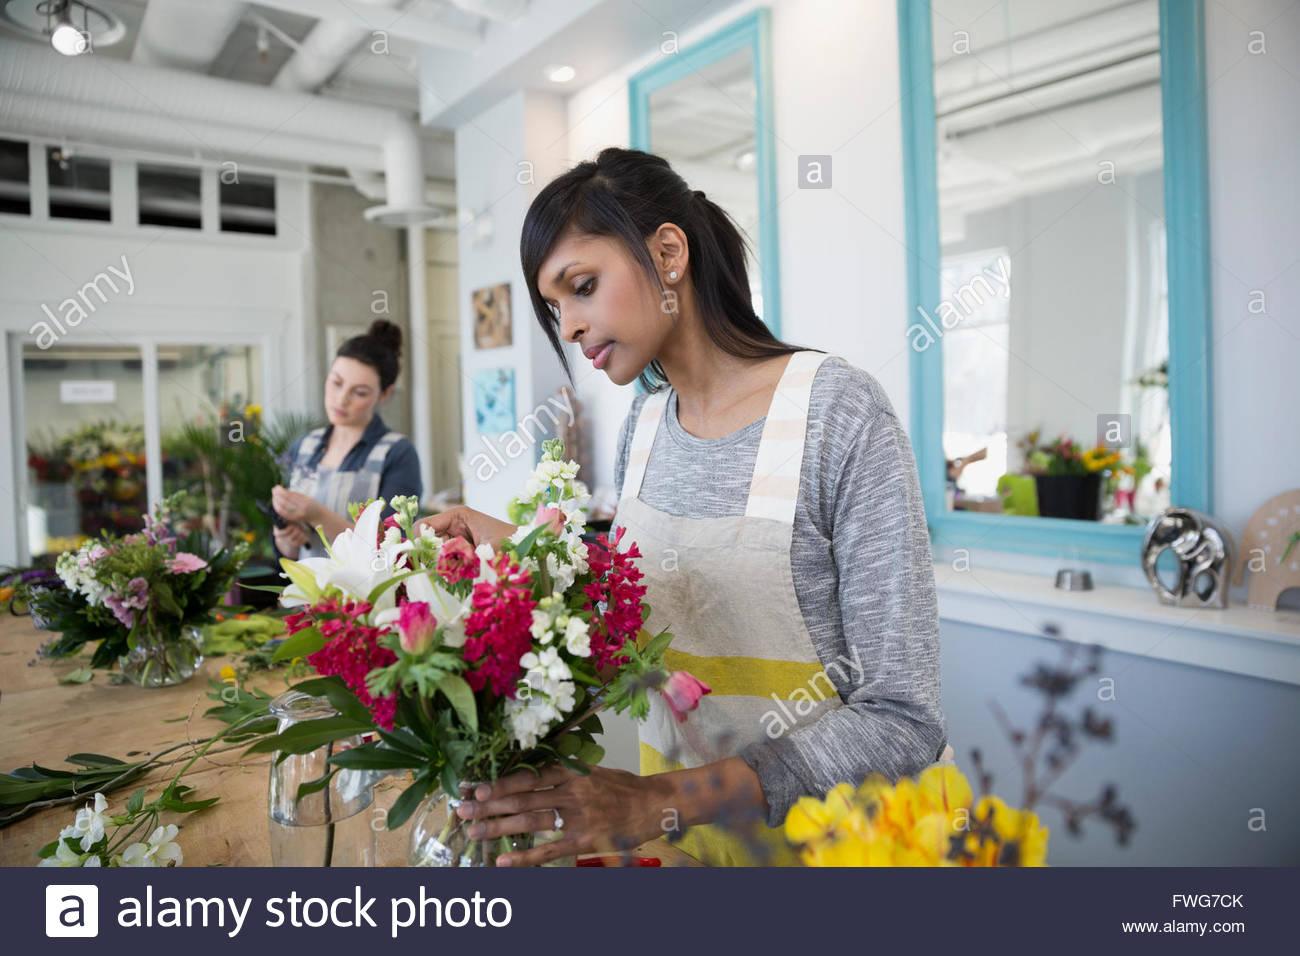 Florist arranging flower bouquet in flower shop - Stock Image